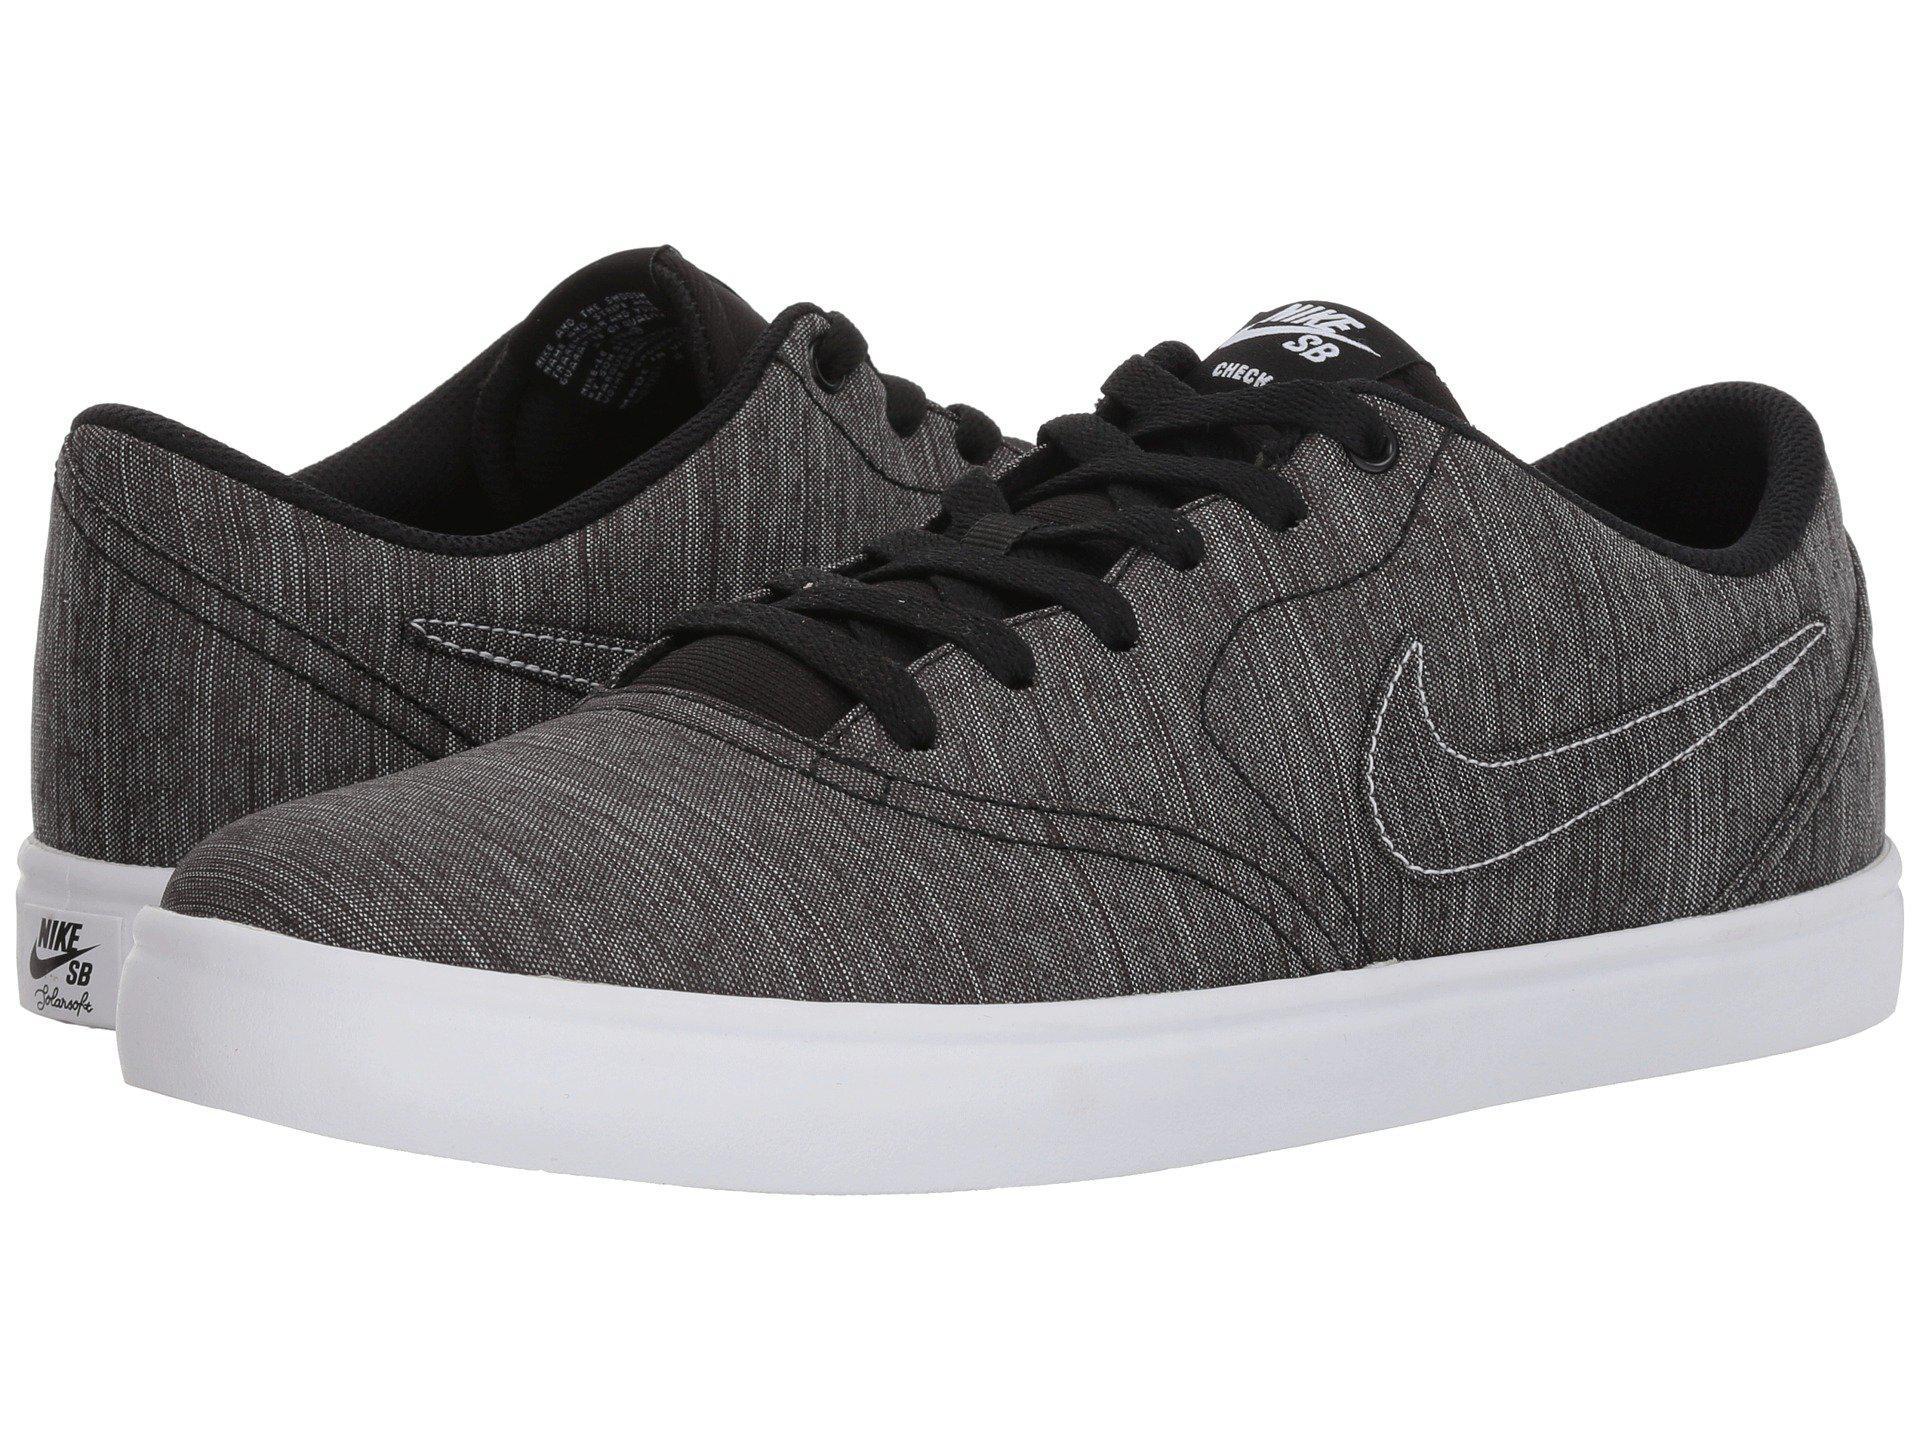 7994f3c7b72d9 Lyst - Nike Check Solar Canvas Premium (black black white) Men s ...